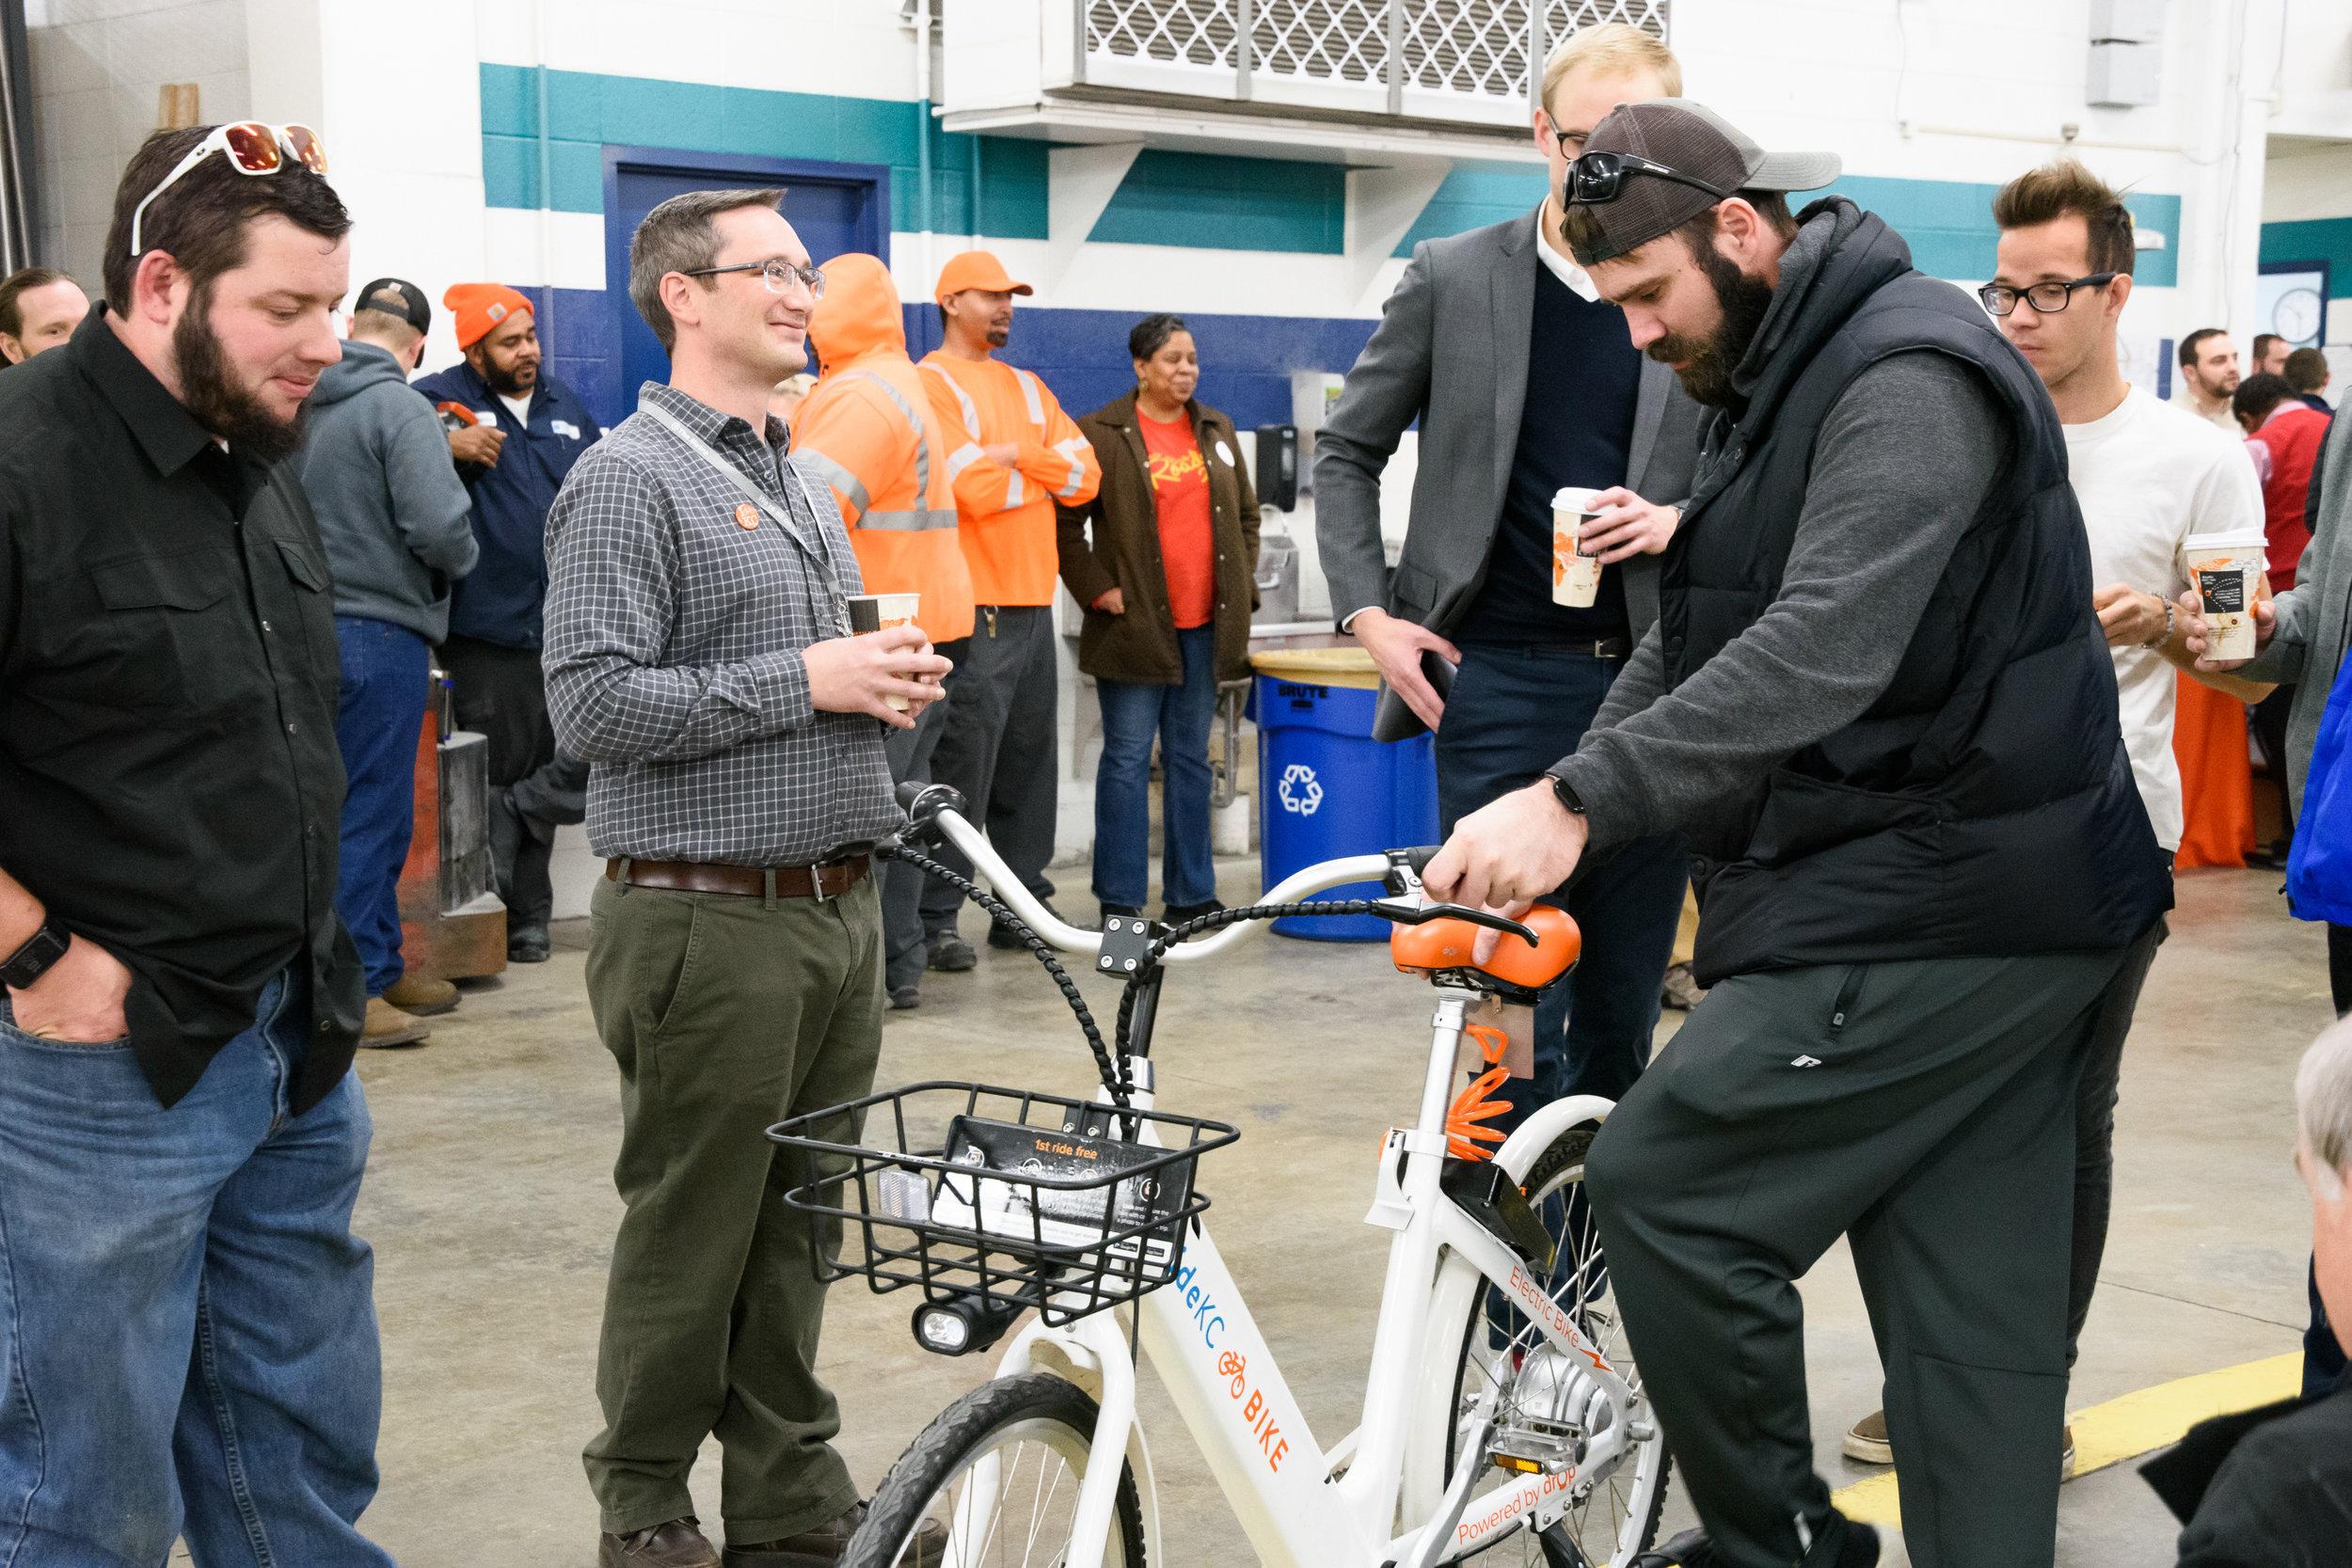 ridekc-bike-launch-event_45438340684_o.jpg